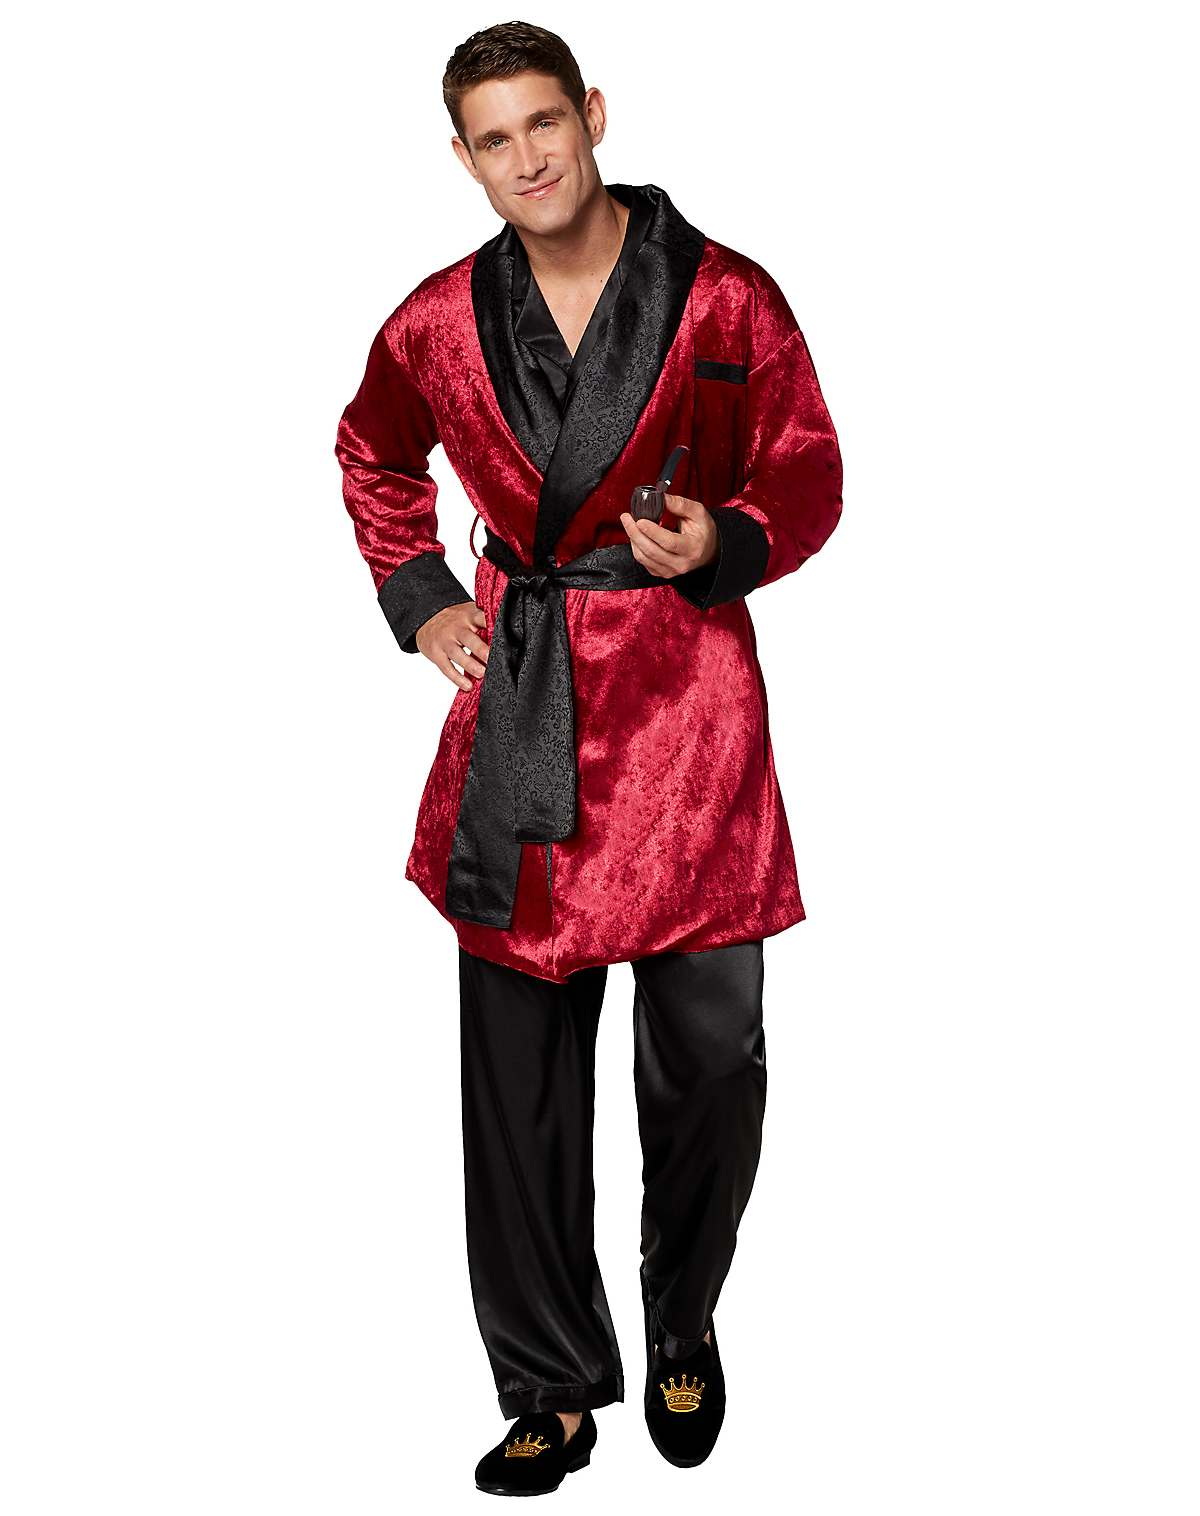 Plus size Casanova robe